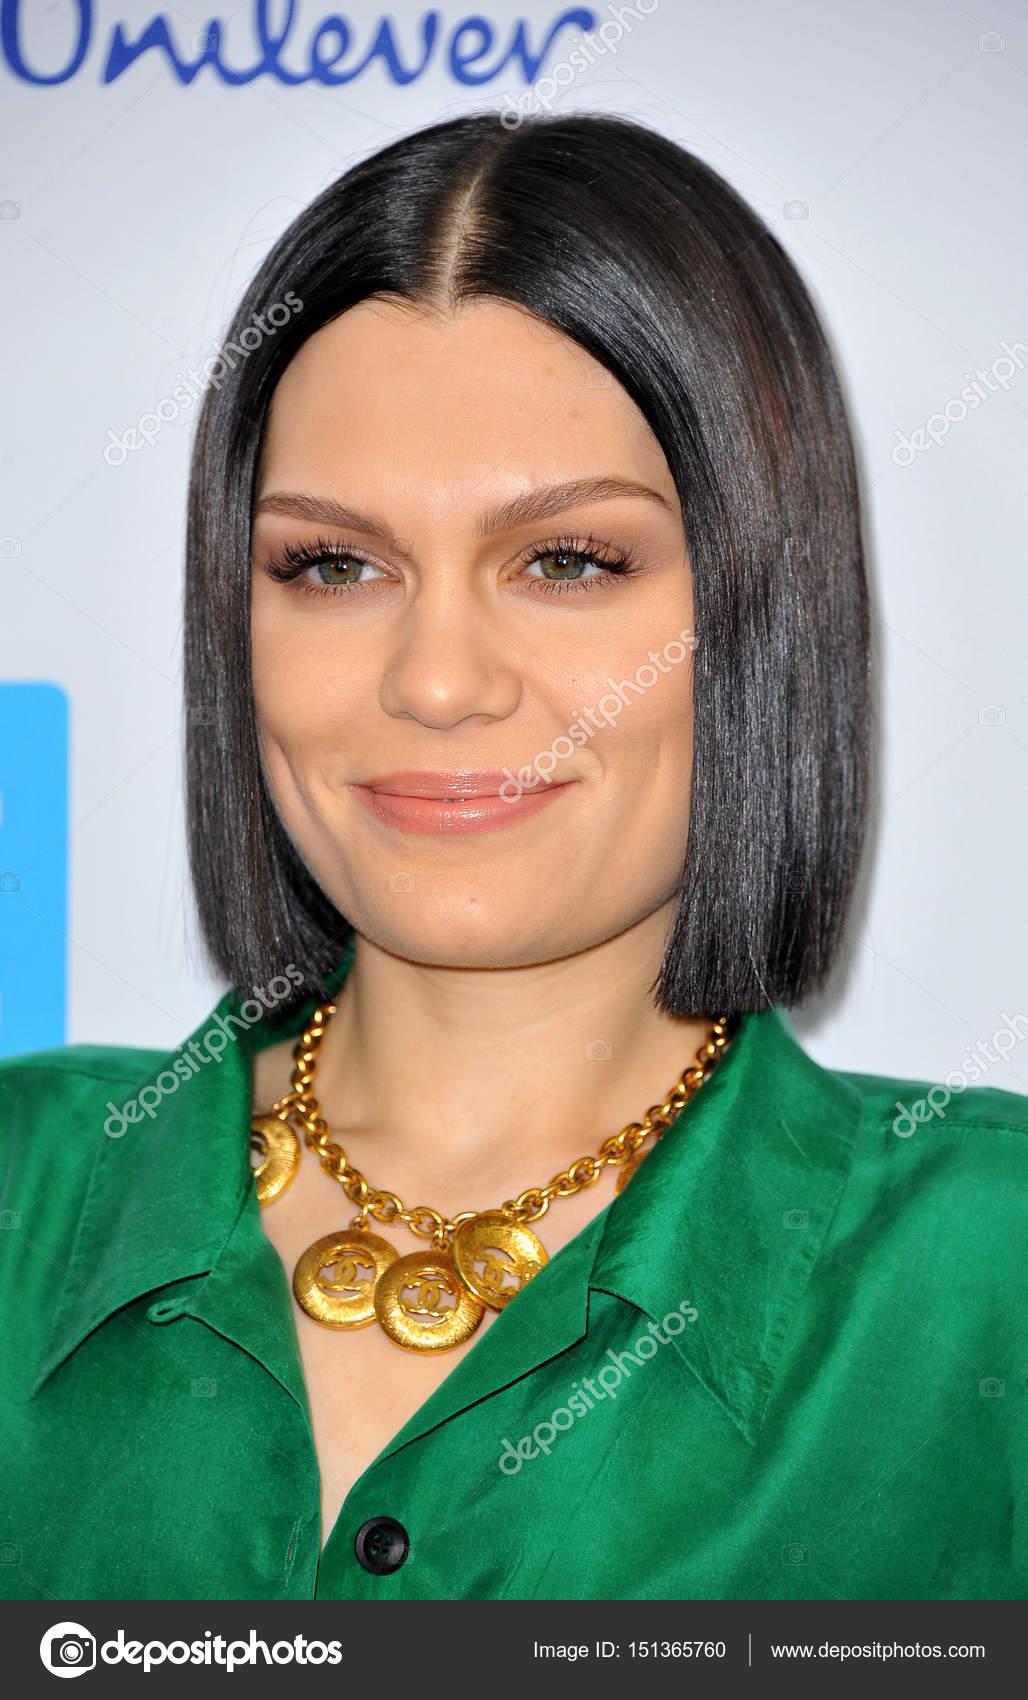 Jessie J Фото Певица Джесси j – Стоковое редакционное фото © popularimages